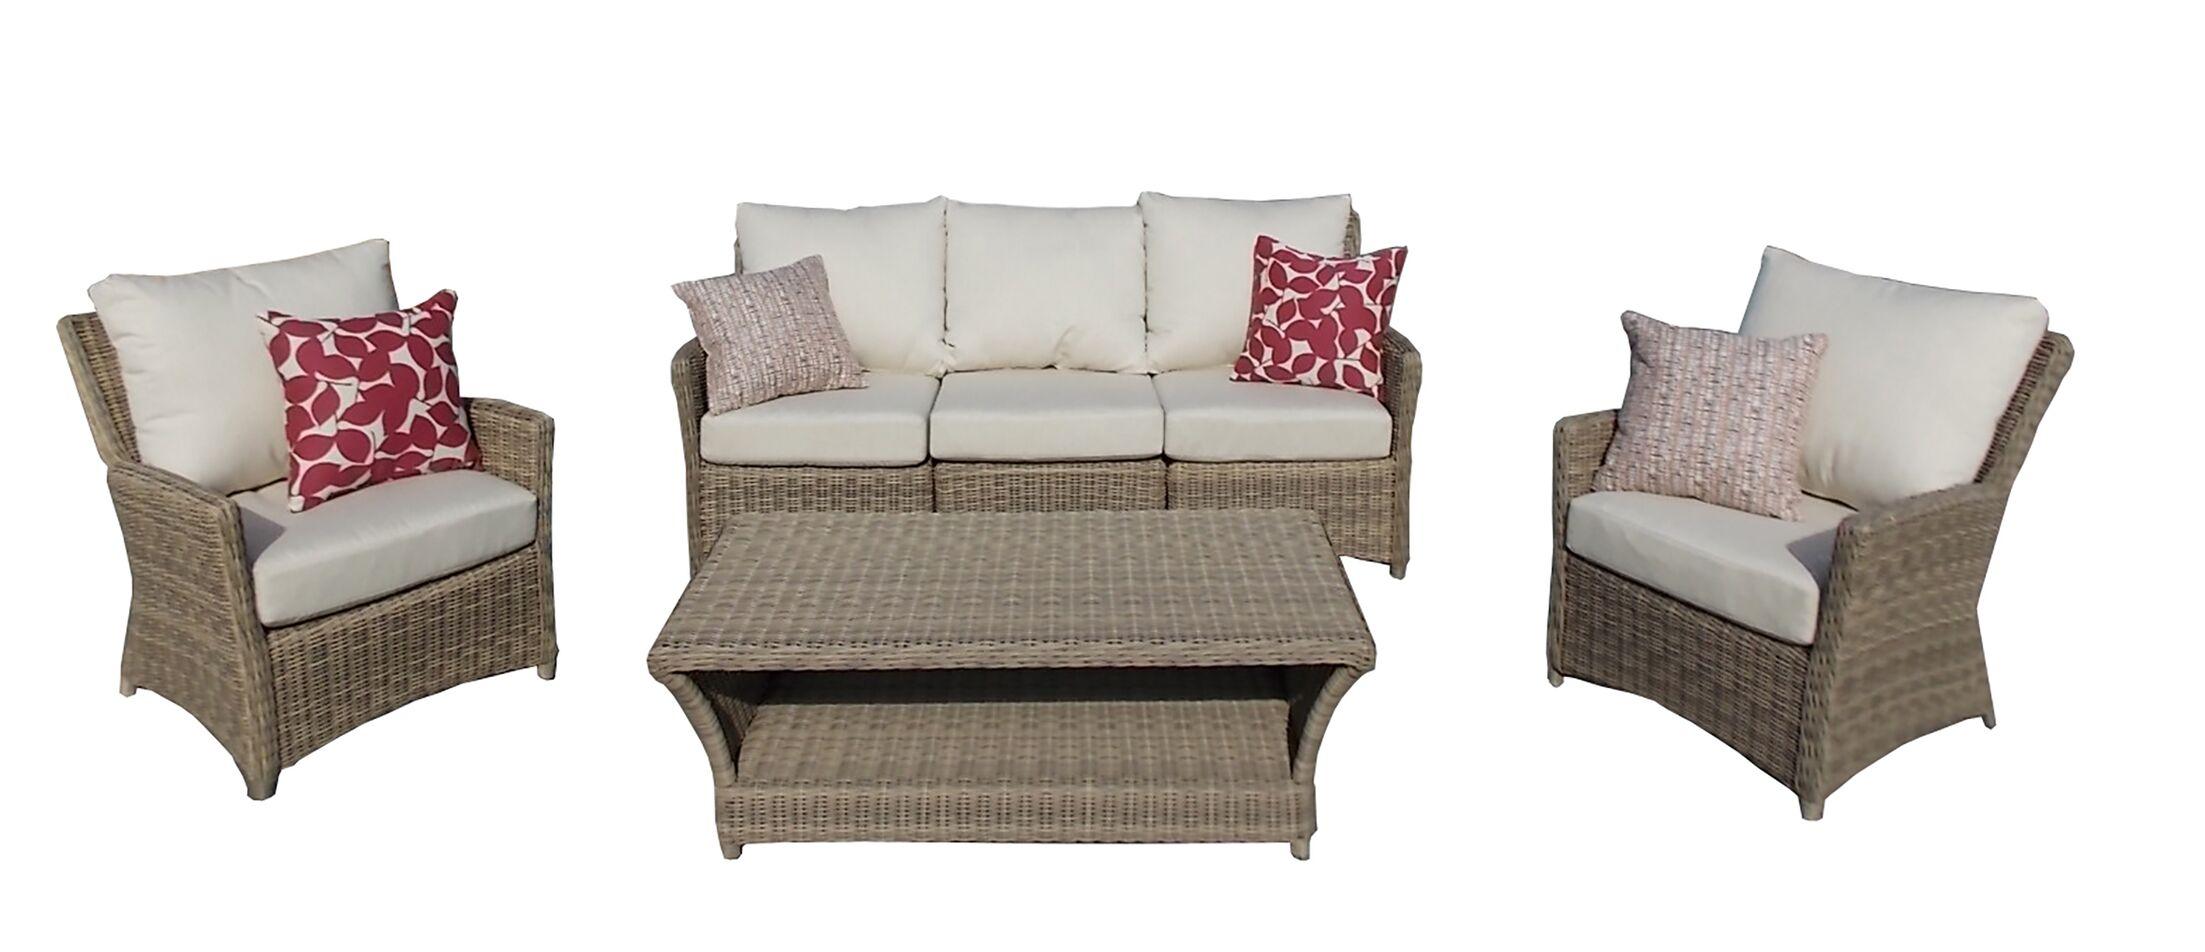 Leamont 4 Piece Sunbrella Sofa Set with Cushions